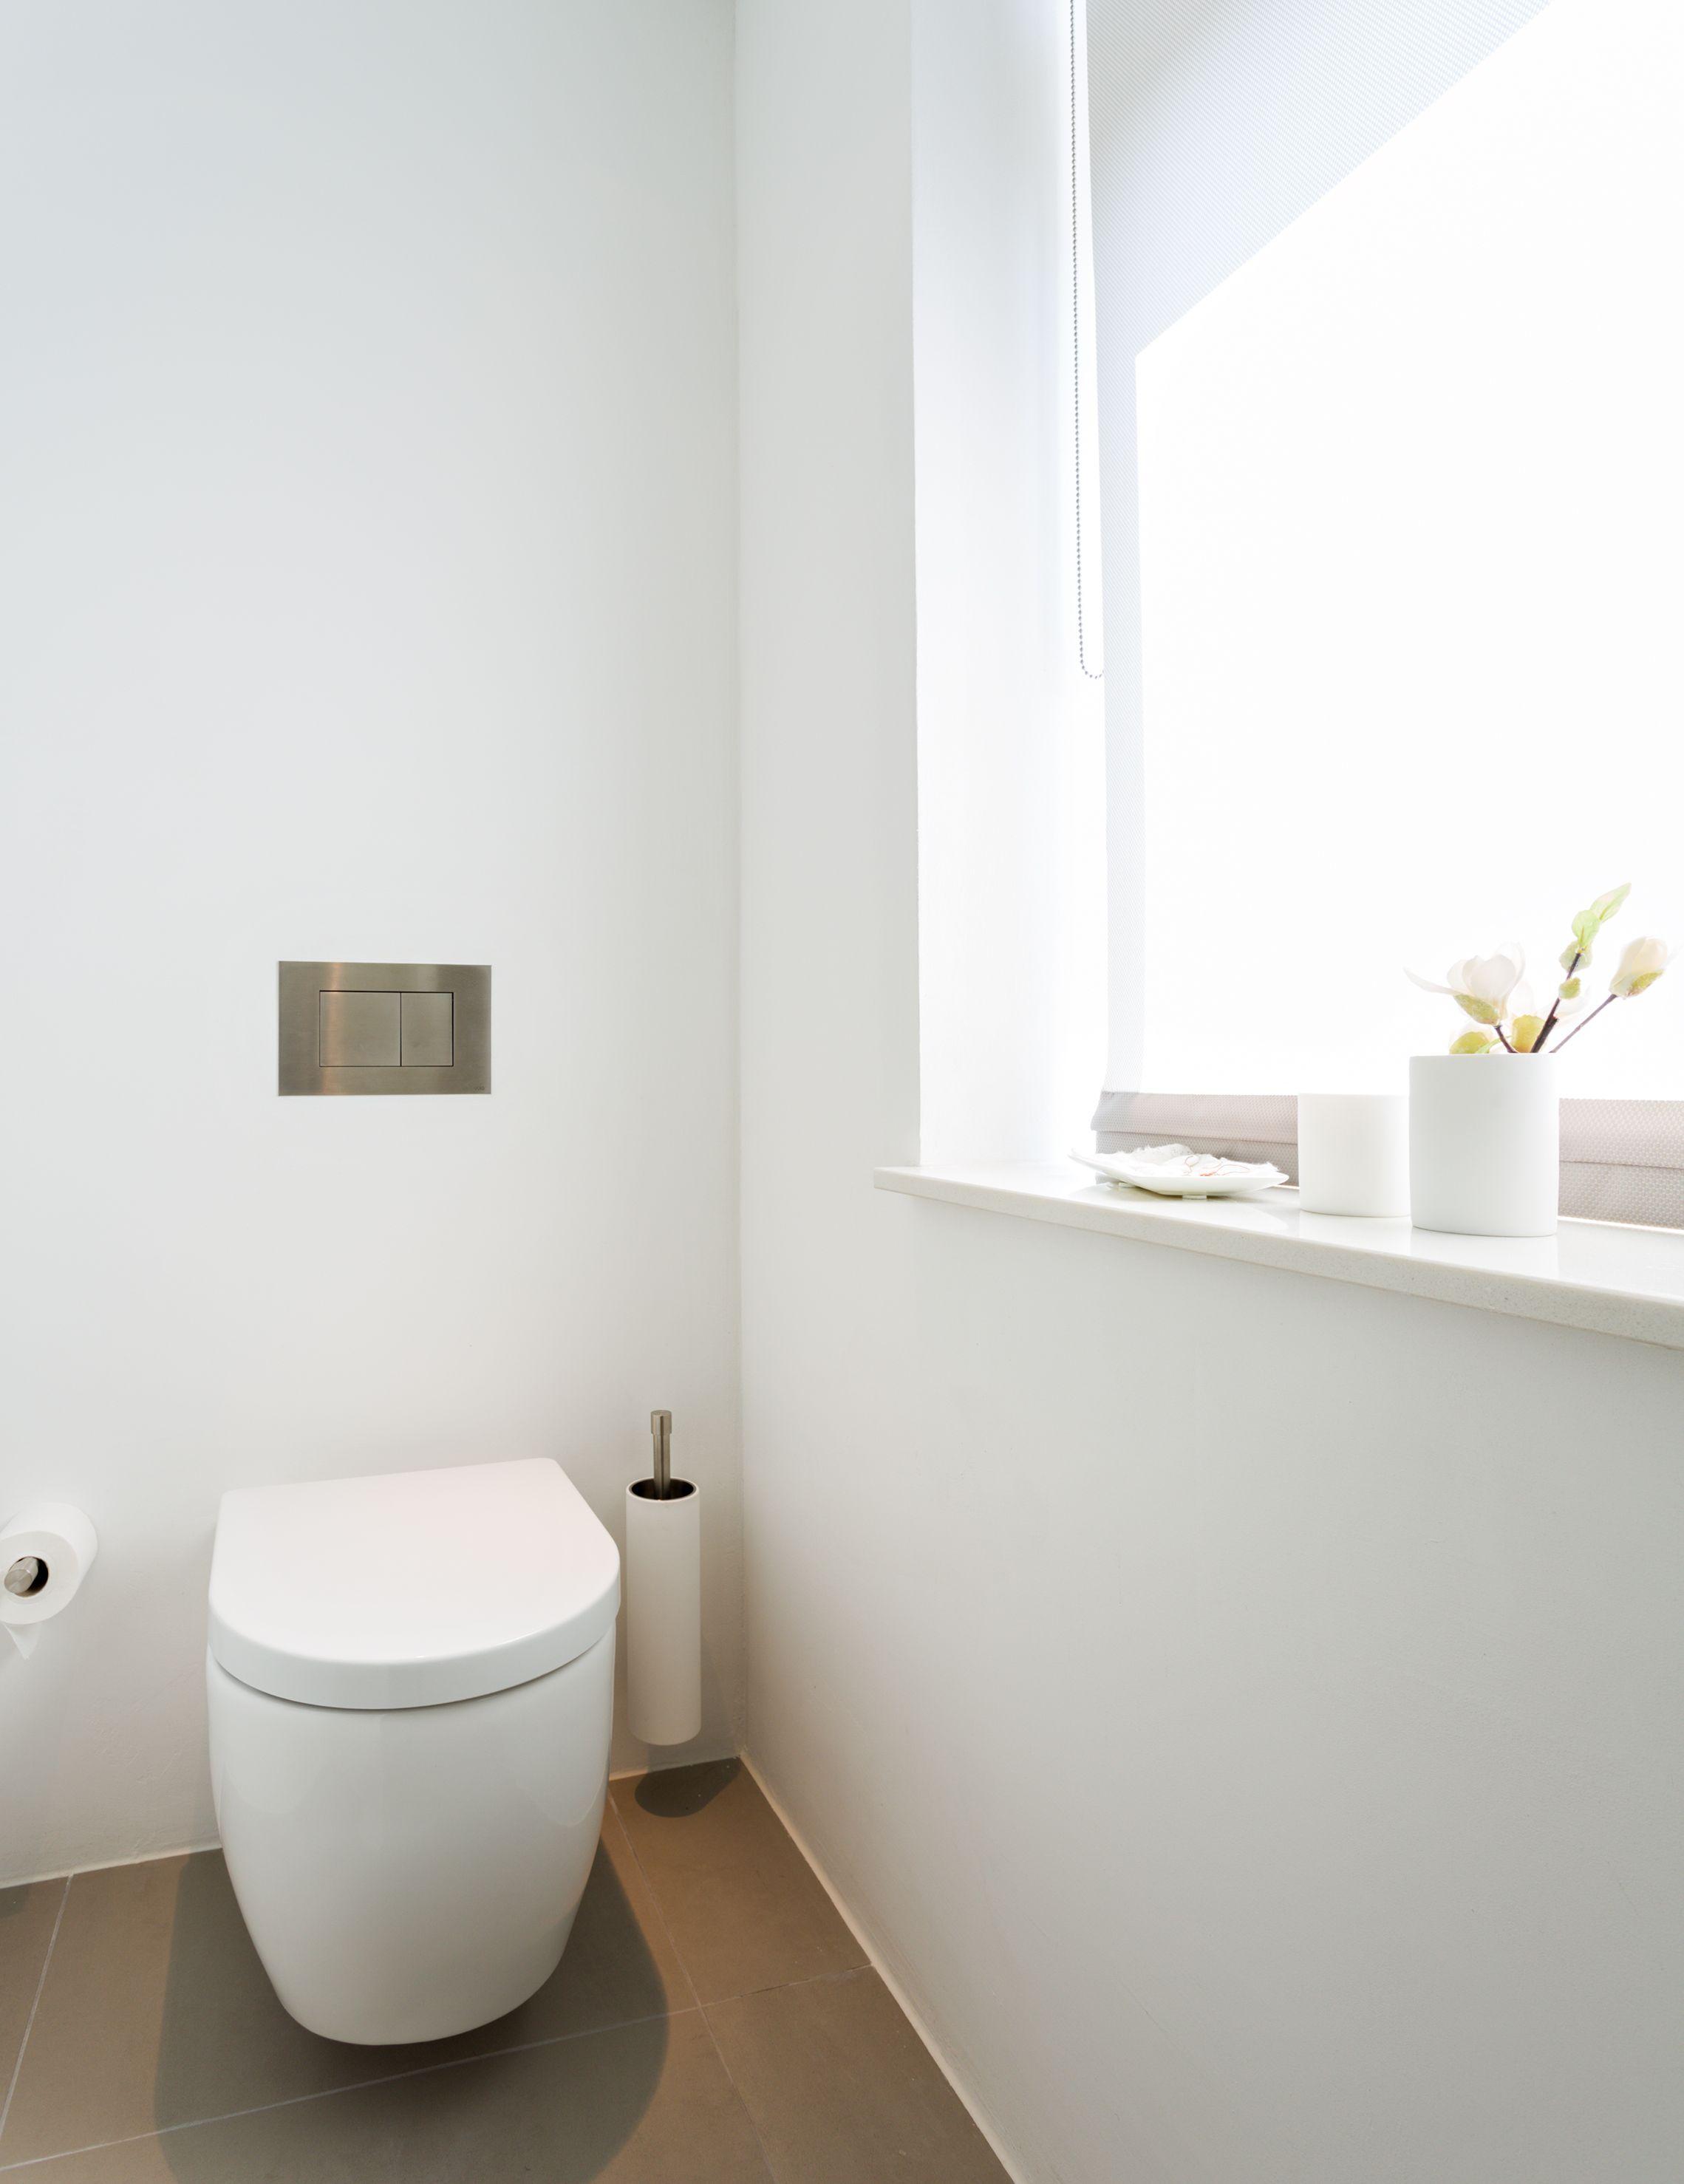 Prachtig witte badkamer #prefab www.mycuby.nl | Ontwerpen prefab ...